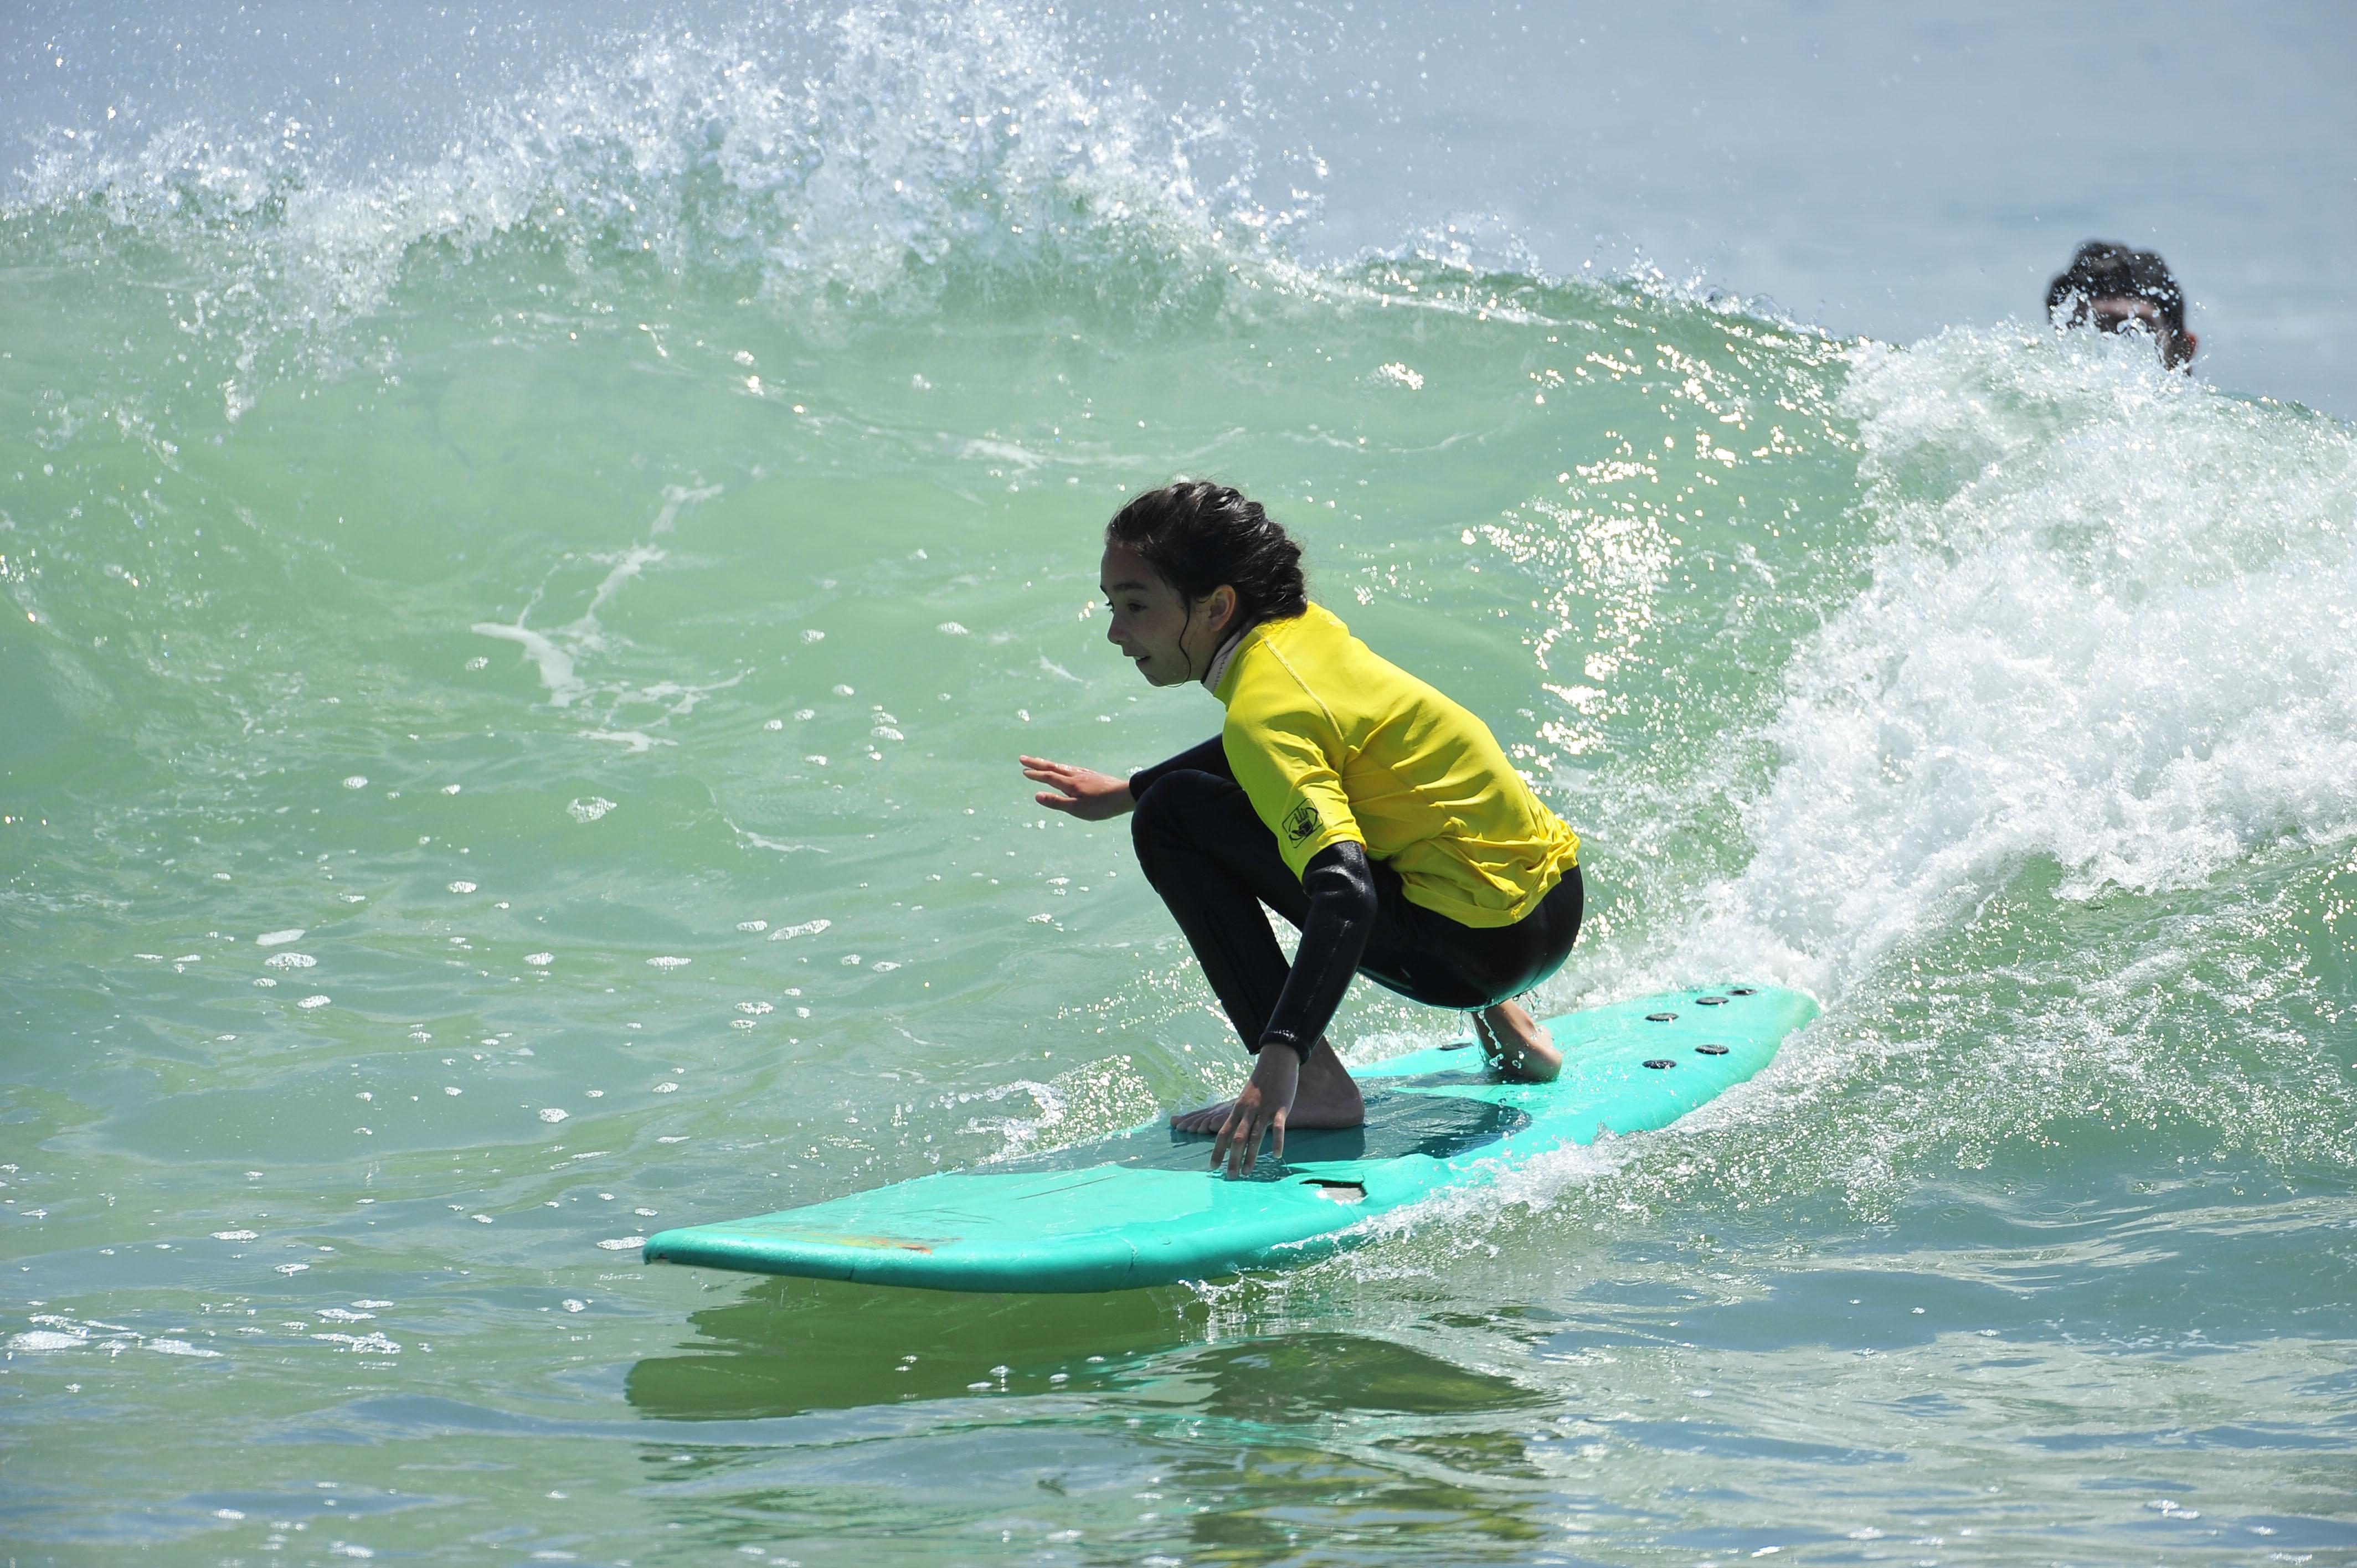 Summertime Surf Camp surf lessons